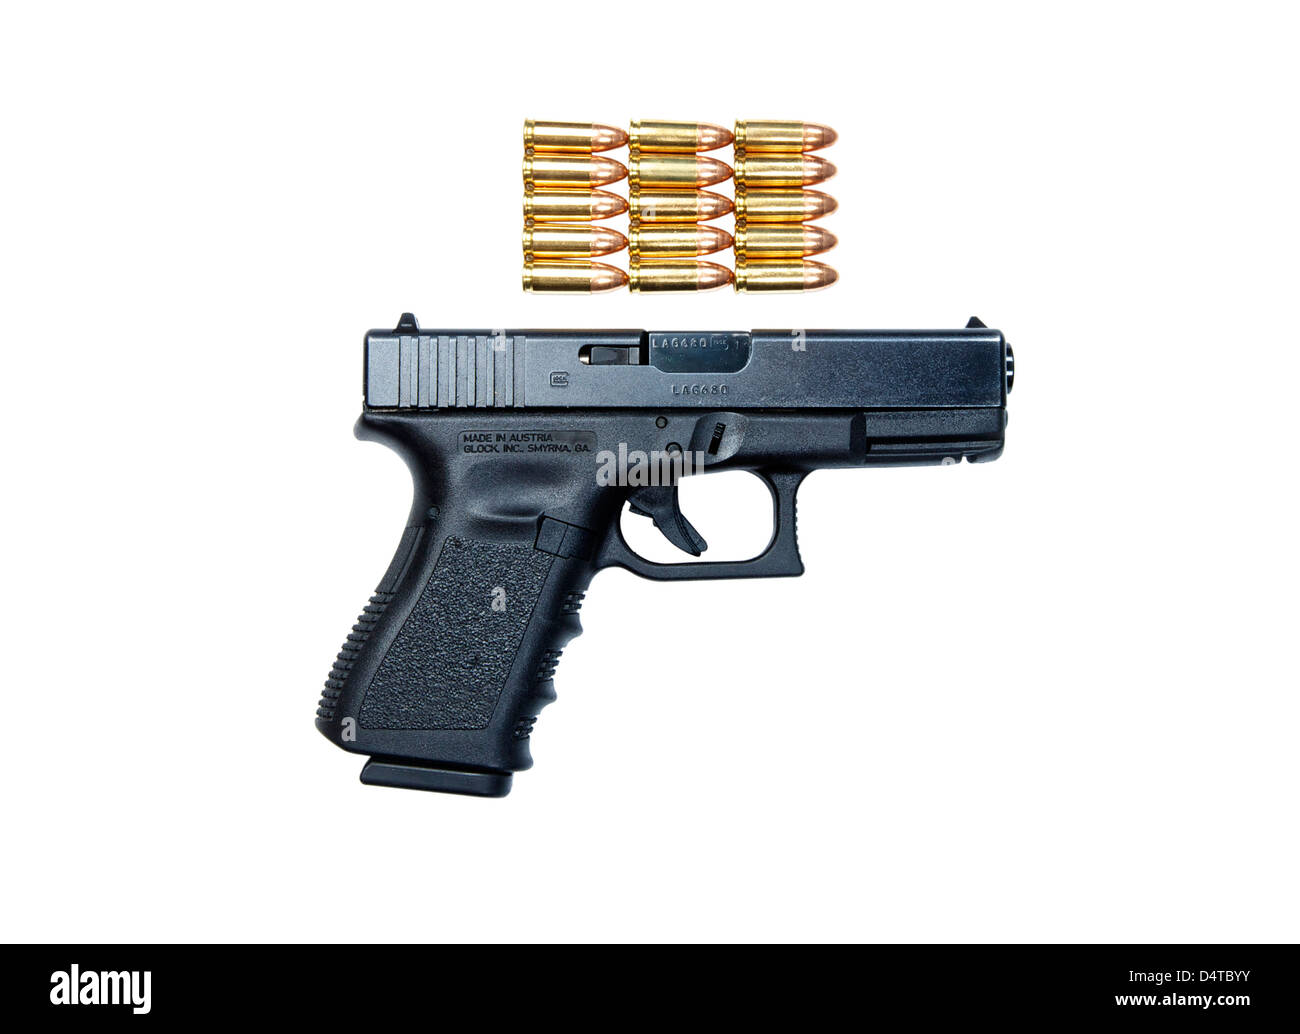 Glock Model 19 handgun with 9mm ammunition. - Stock Image